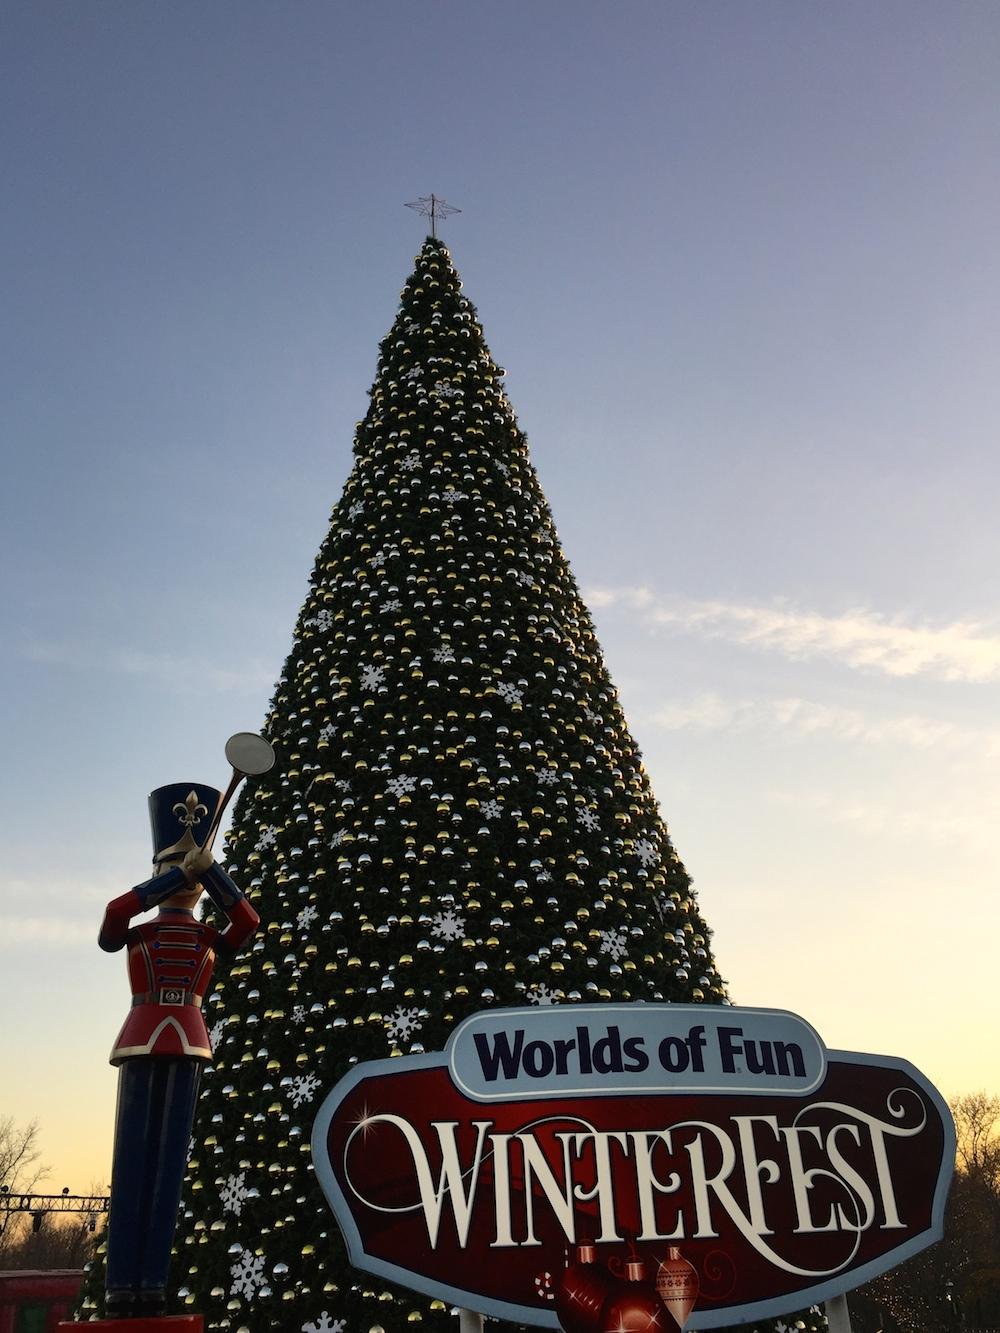 70-foot-tall tree at Worlds of Fun's WinterFest in Kansas City, Missouri